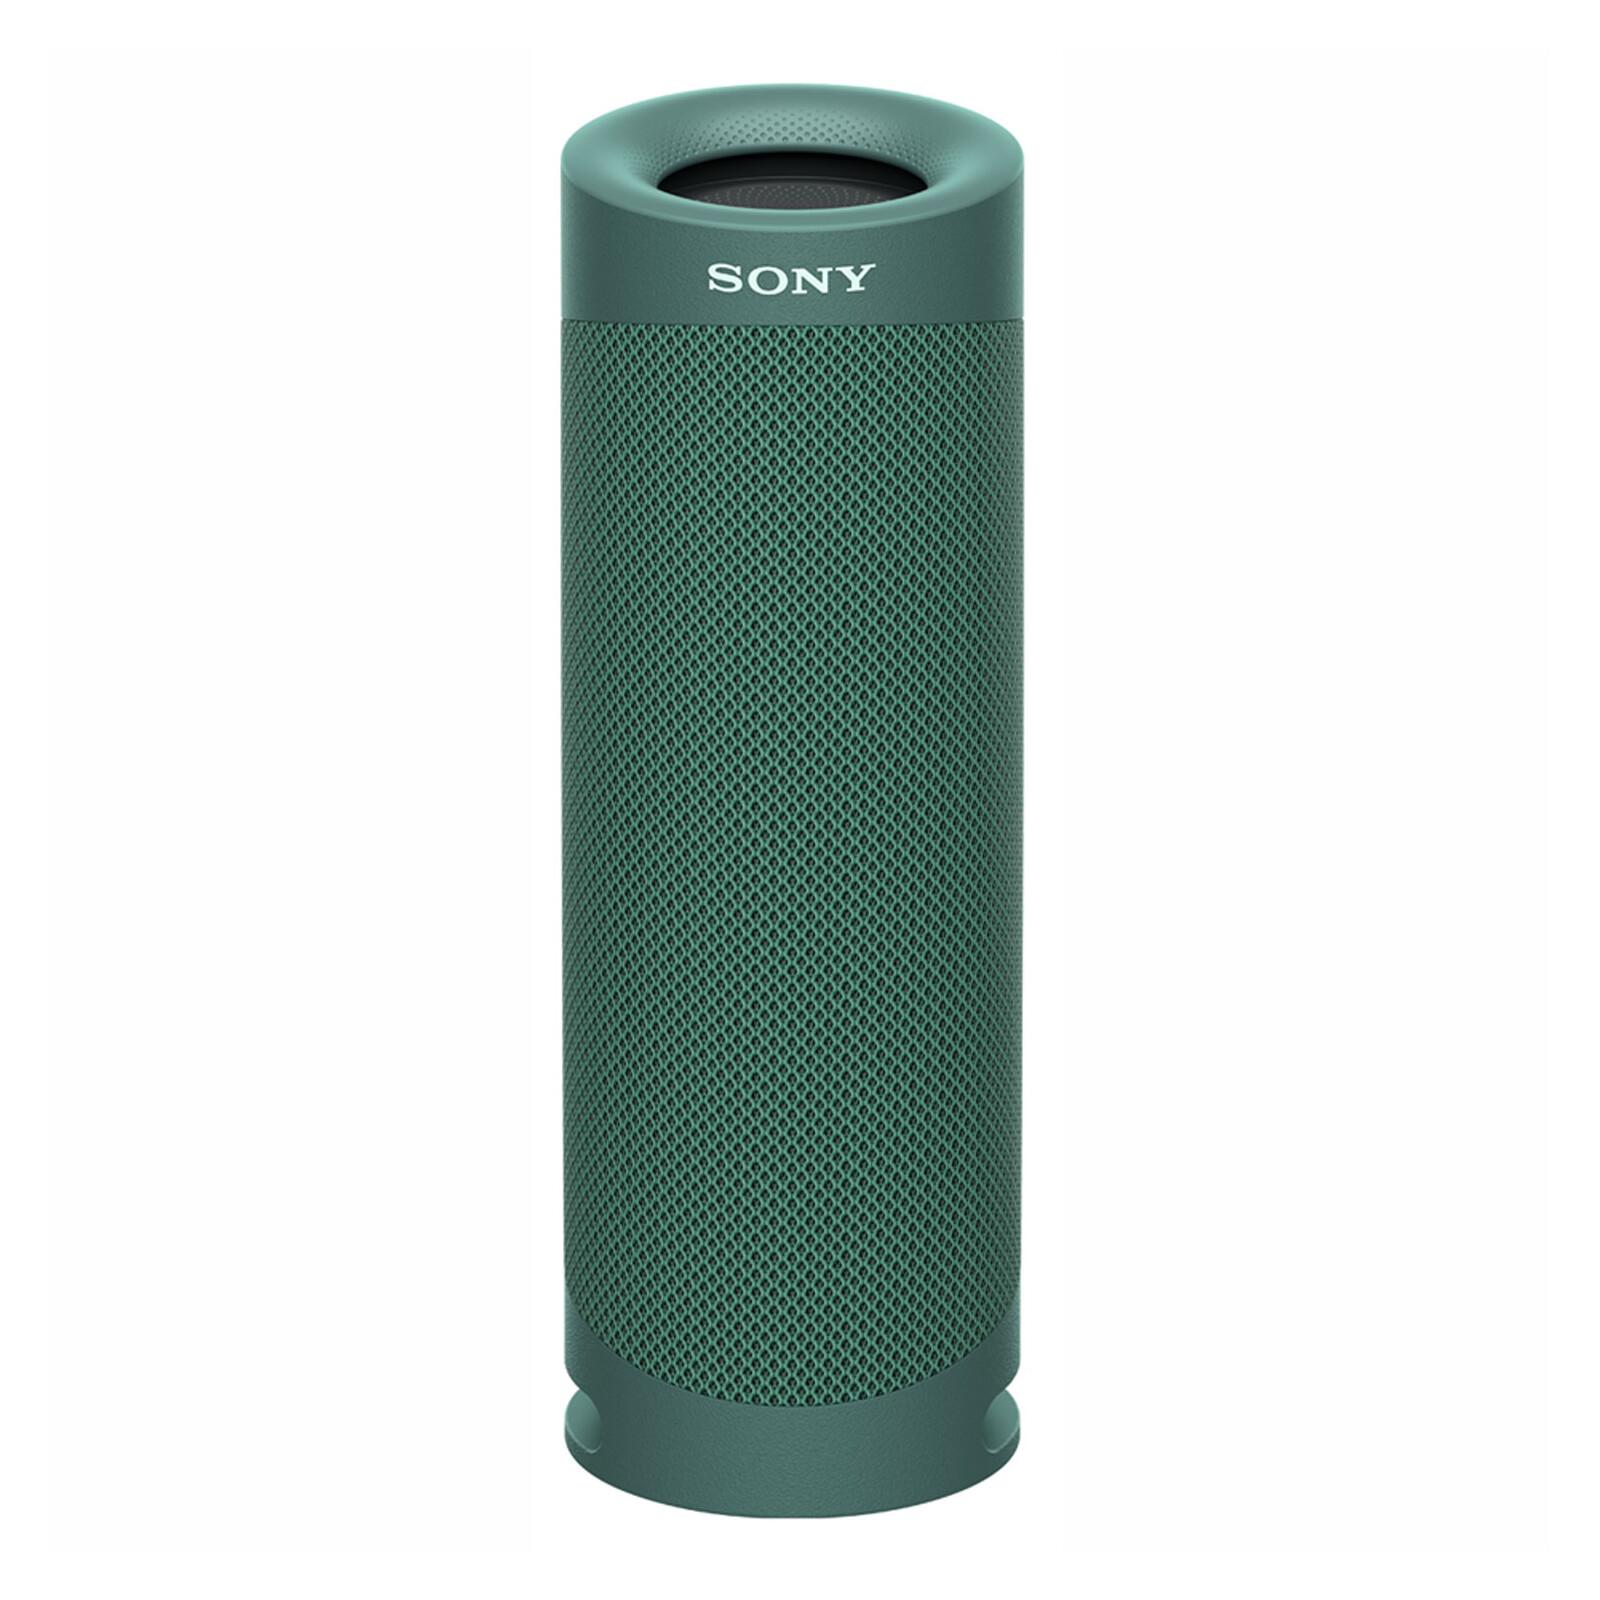 Sony SRS-XB23G Bluetooth Lautsprecher grün